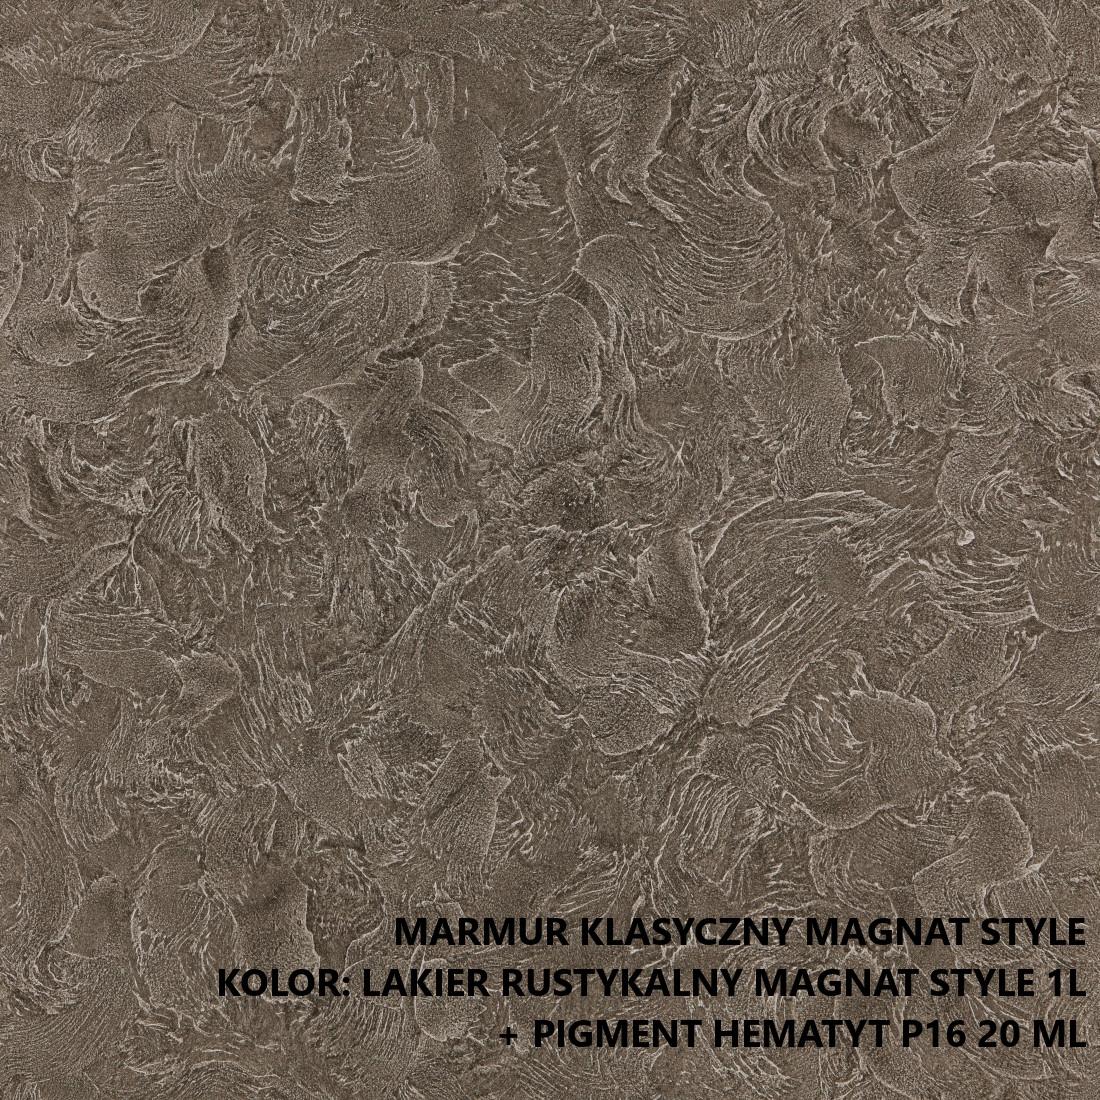 Marmur Klasyczny Magnat Style Dekoracyjny Tynk Ozdobny 6kg Super Cena